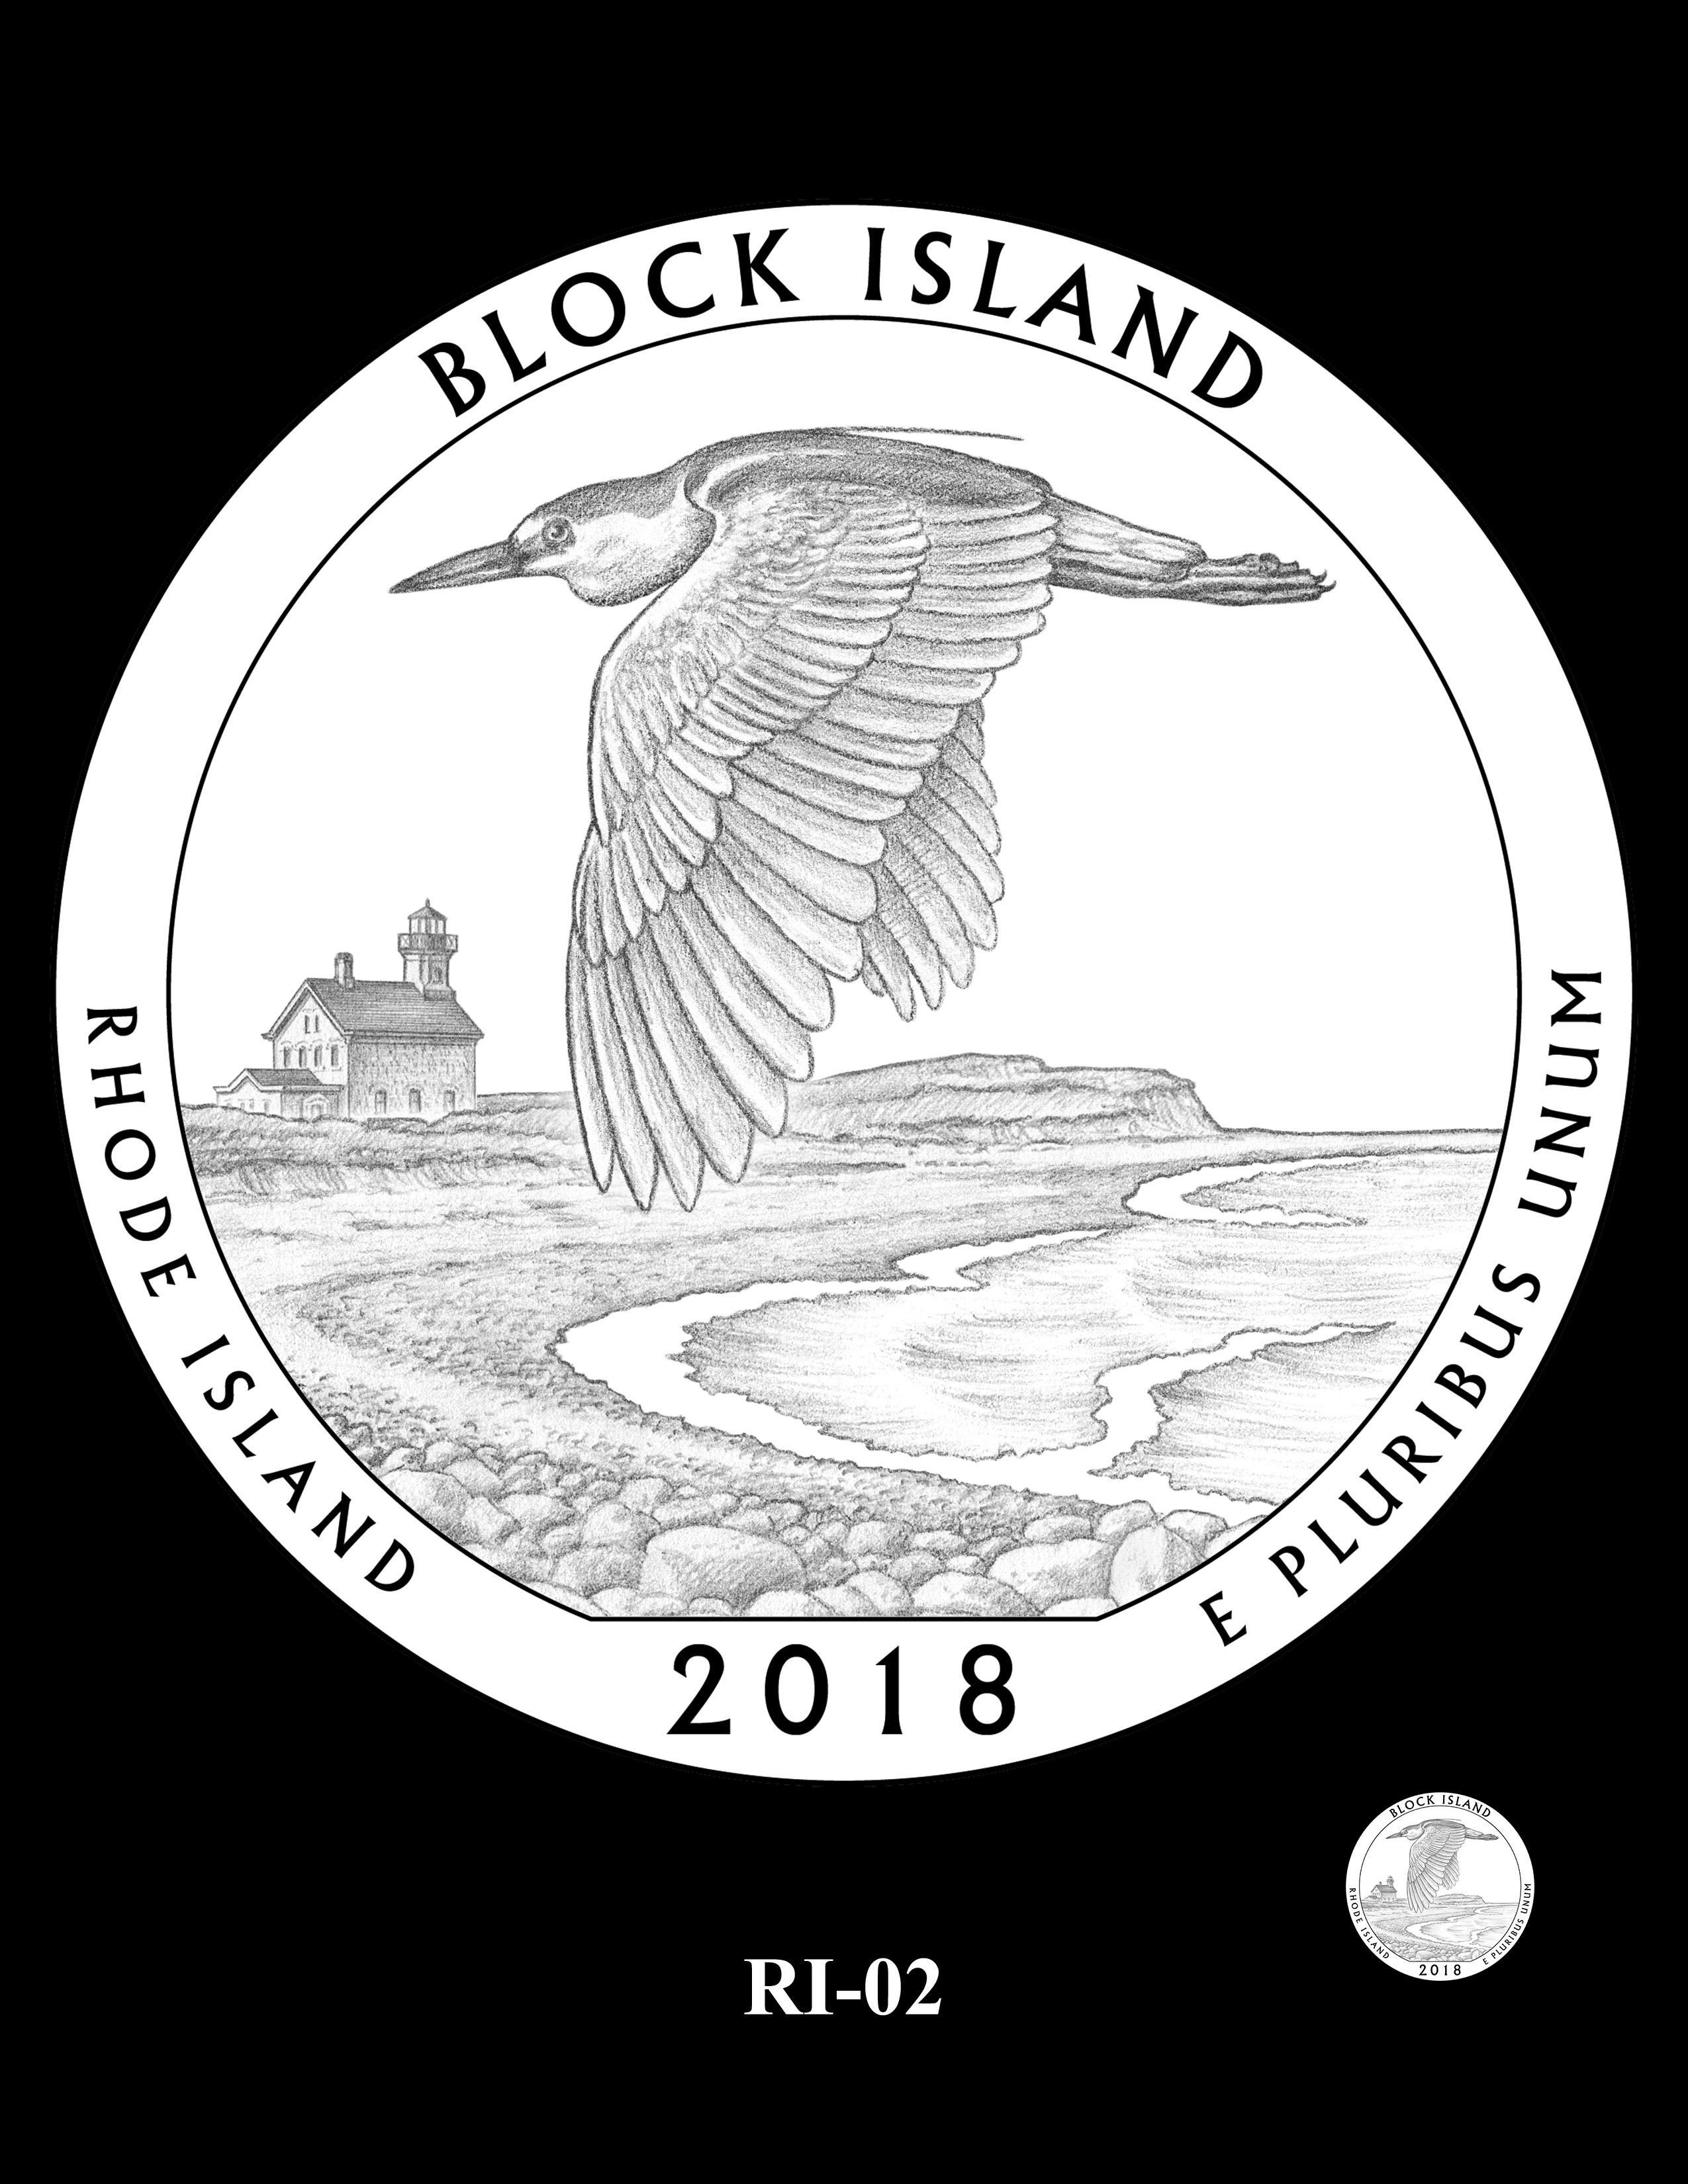 RI-02 -- 2018 America the Beautiful® Quarters Program